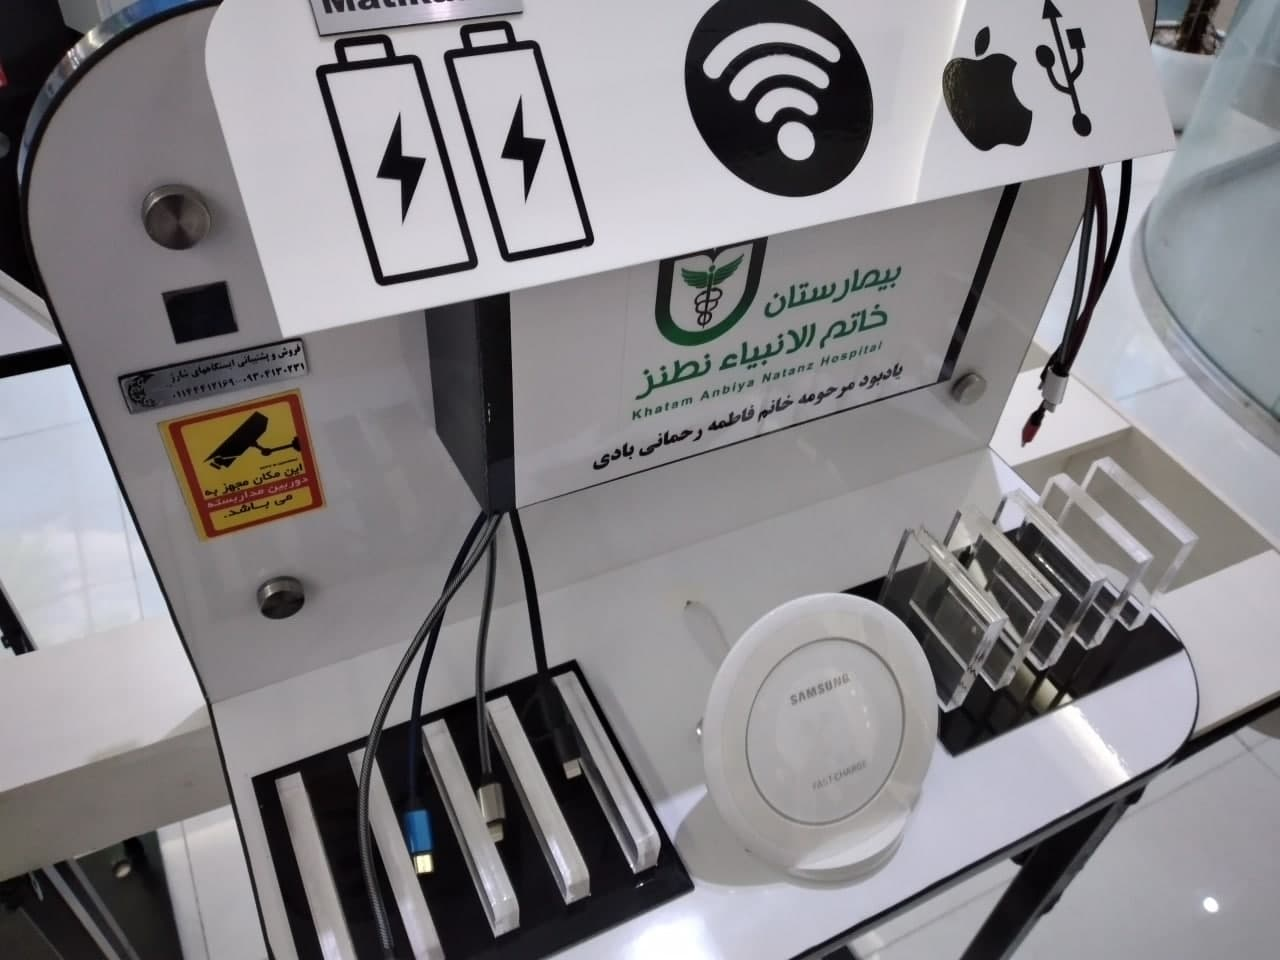 شارژر – شارژ موبایل – استند شارژر موبایل – استند شارژر اماکن عمومی – استند شارژ موبایل - استند شارژ - ایستگاه شارژ موبایل - شارژر موبایل - شارژر اماکن عمومی - شارژرهای عمومی - شارژر موبایل اماکن عمومی - شارژر وایرلس - شارژر بی سیم – ایستگاه شارژ - شارژرهای فست - شارژر رومیزی – استند موبایل – استند عمومی موبایل – شارژر عمومی – تابلو اعلانات – تابلو اطلاعات هوشمند – شارژر چندتایی – تابلو اطلاع رسانی – شارژرها - Charger - Mobile Charging - Mobile Charger Stand - Public Storage Charger - Mobile Charging Stand - Charging Stand - Mobile Charging Station - Mobile Charger - Public Places Charger - General Chargers - Mobile Charger Mobile Charging - Public Places - Charger Fast Chargers -  - Mobile Stands - Mobile Public Stands - General Chargers - Announcement Panels - Smart Information Panels - Multiple Chargers - Information Panels